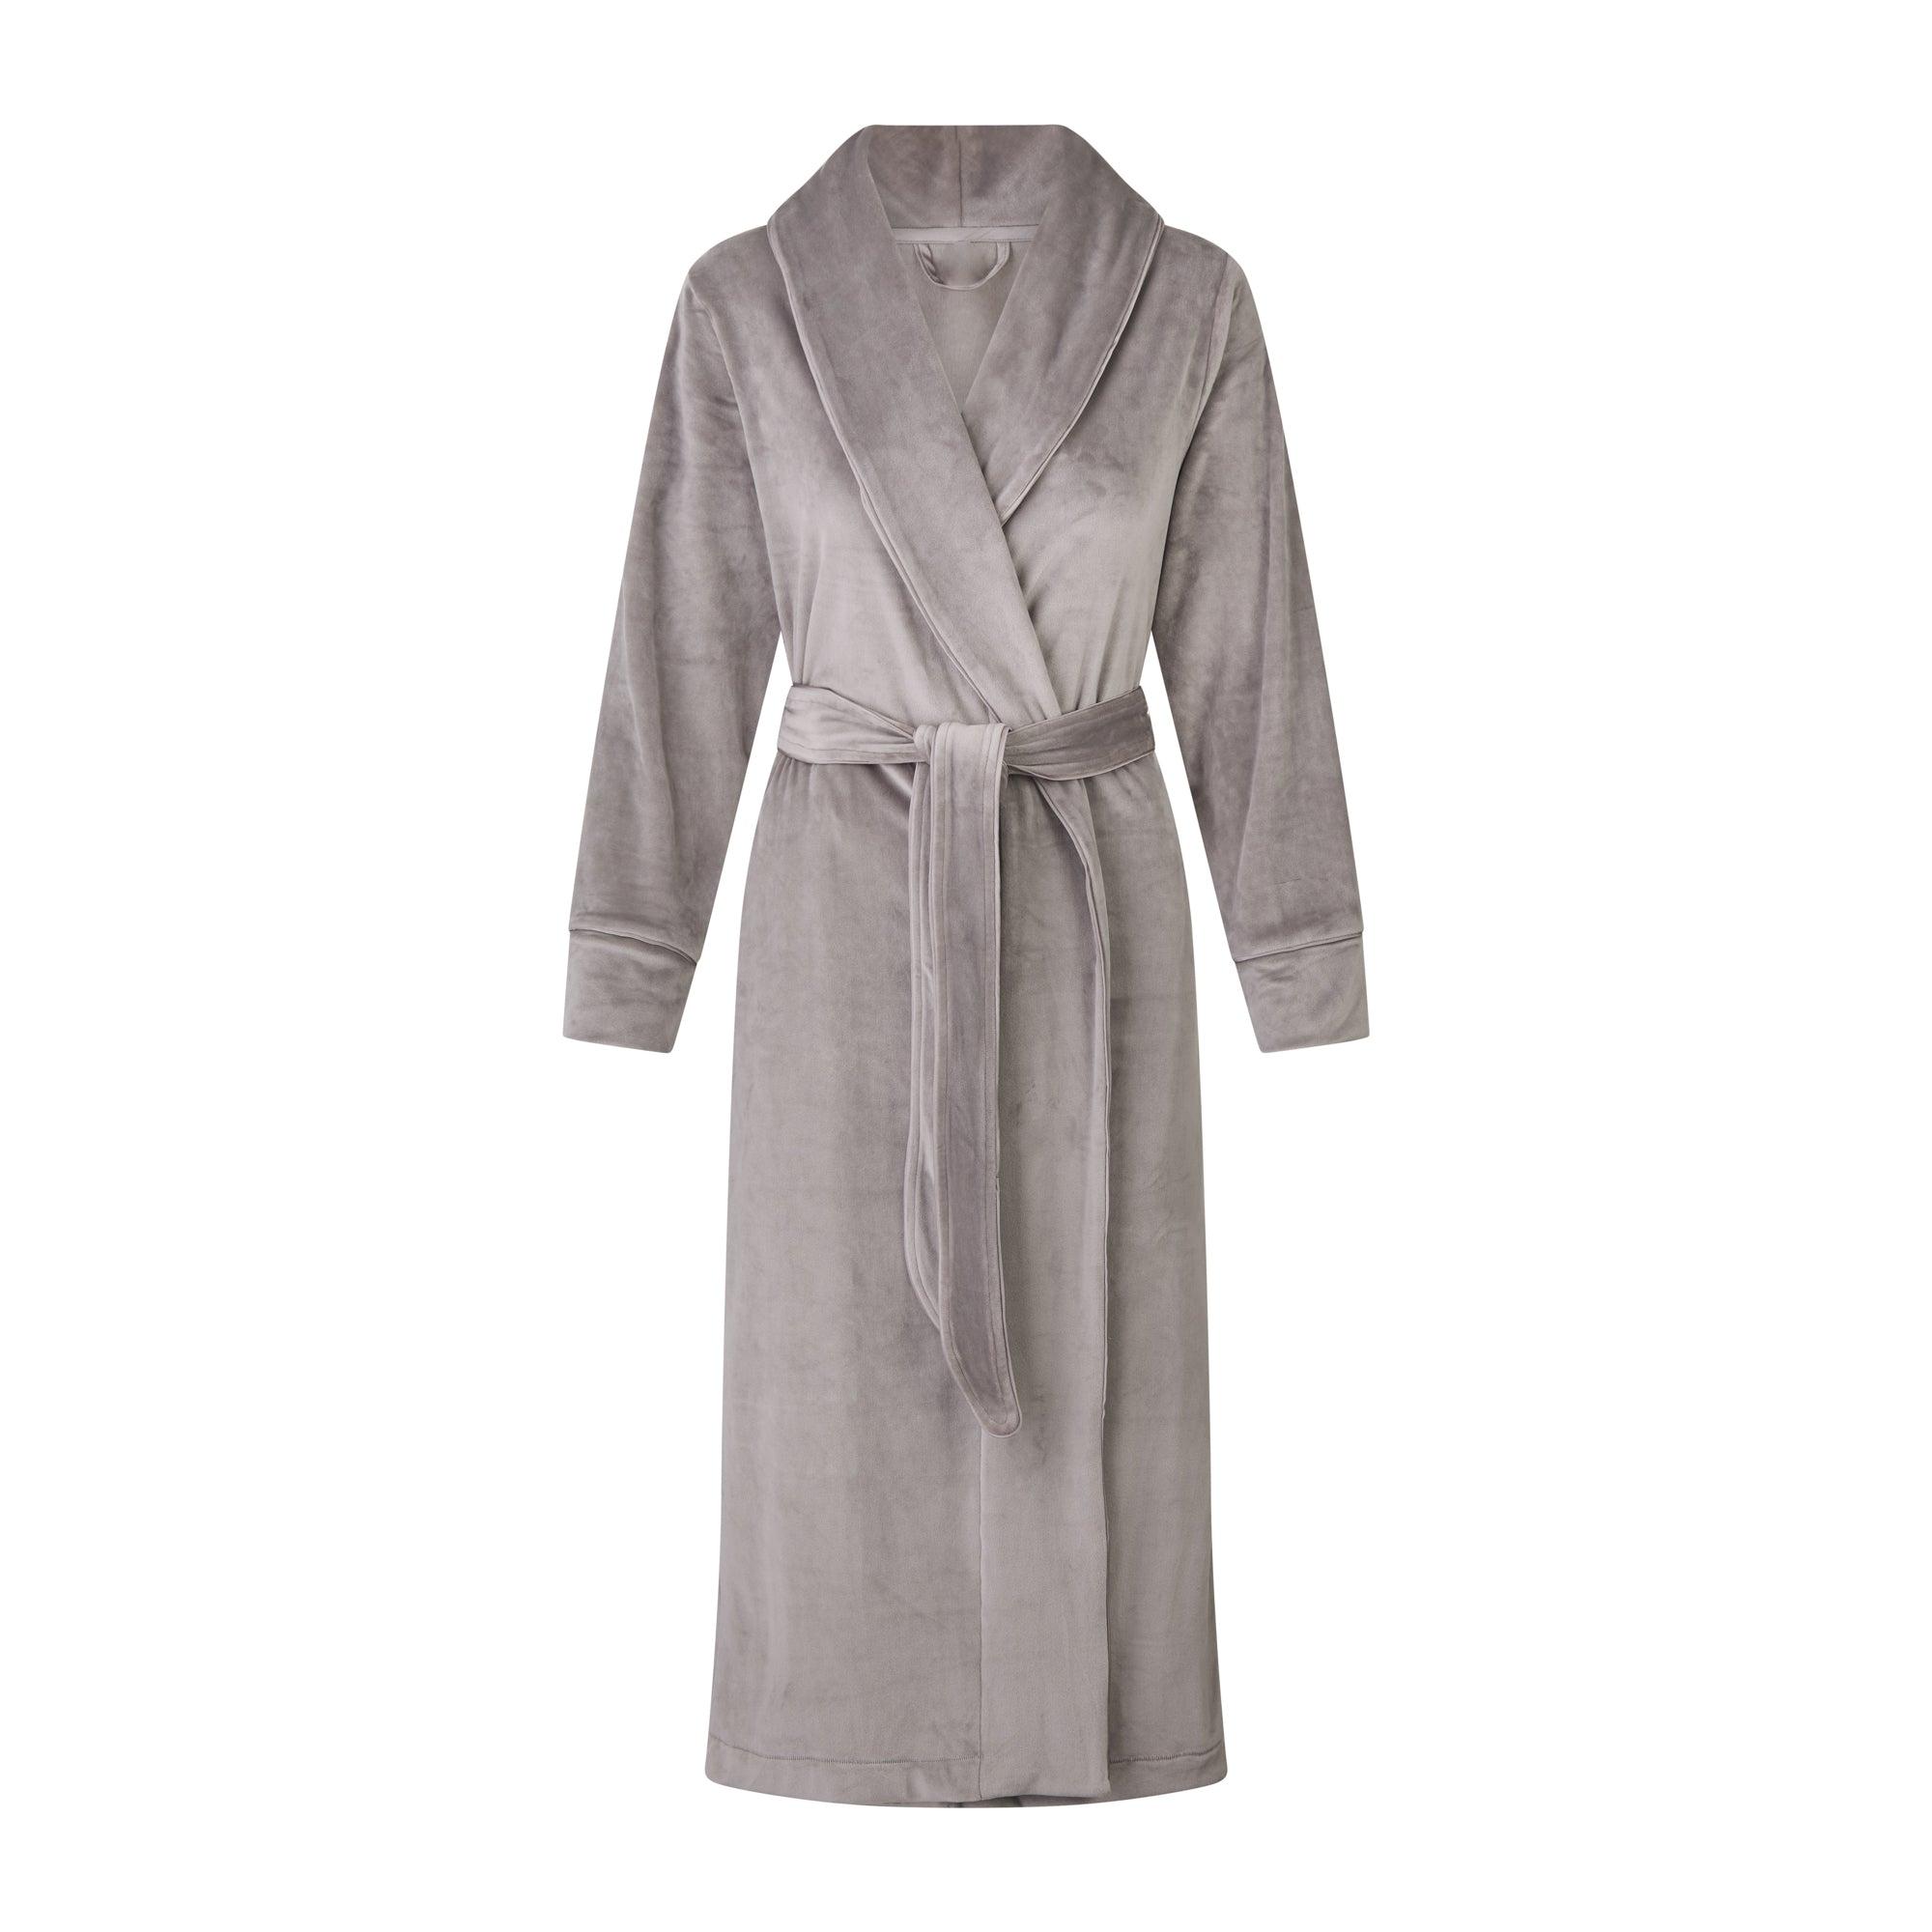 SKIMS Women's Velour Long Robe - Gray - Size M; Gray